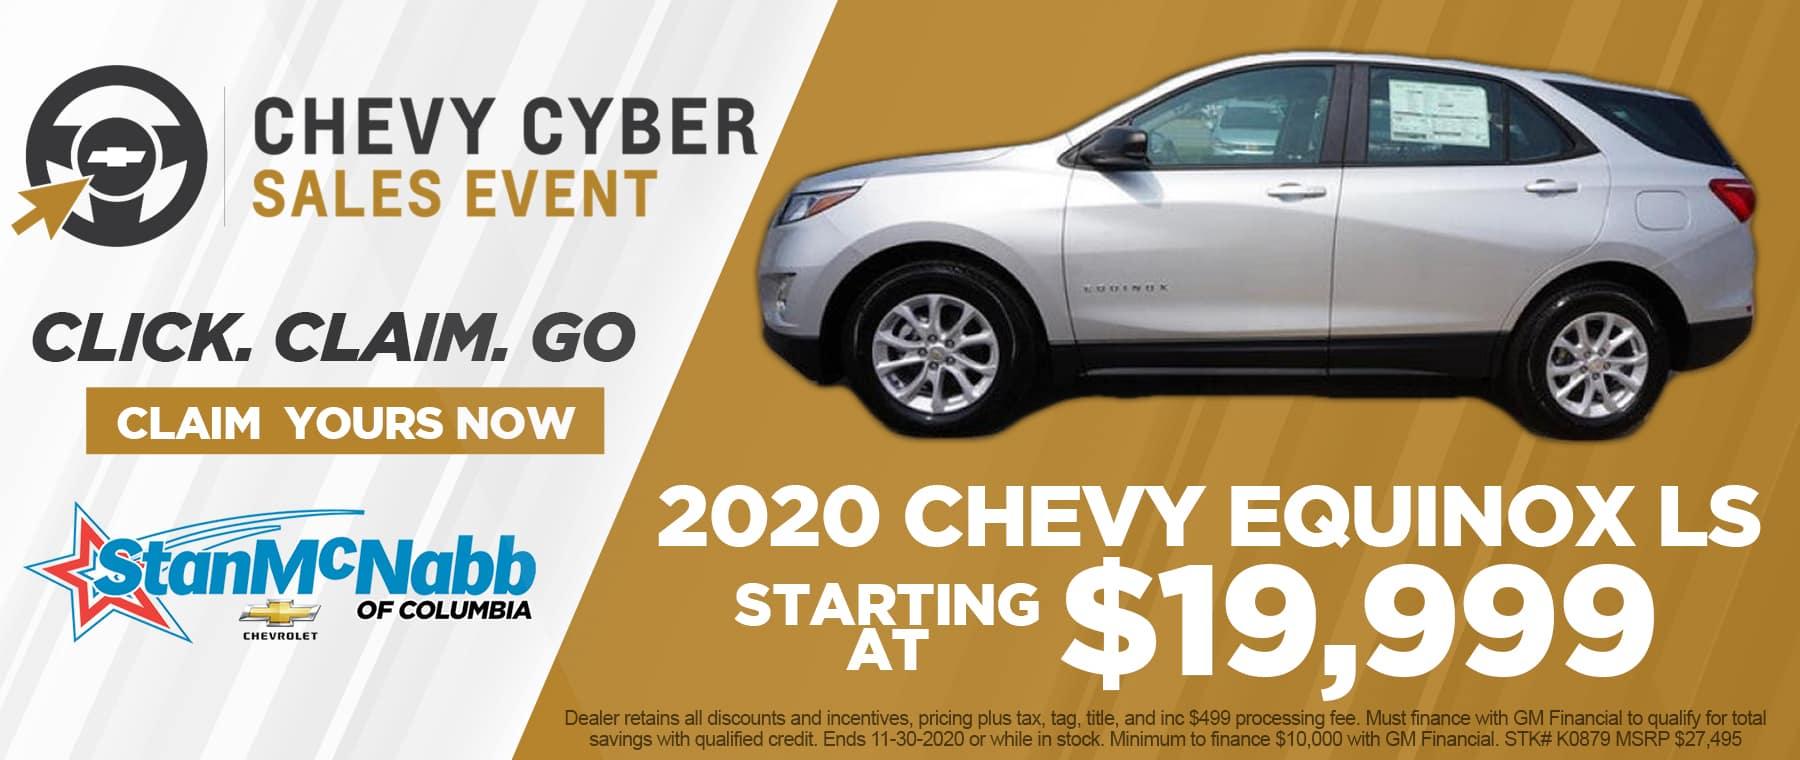 Cyber Sales 2020 Chevy Equinox